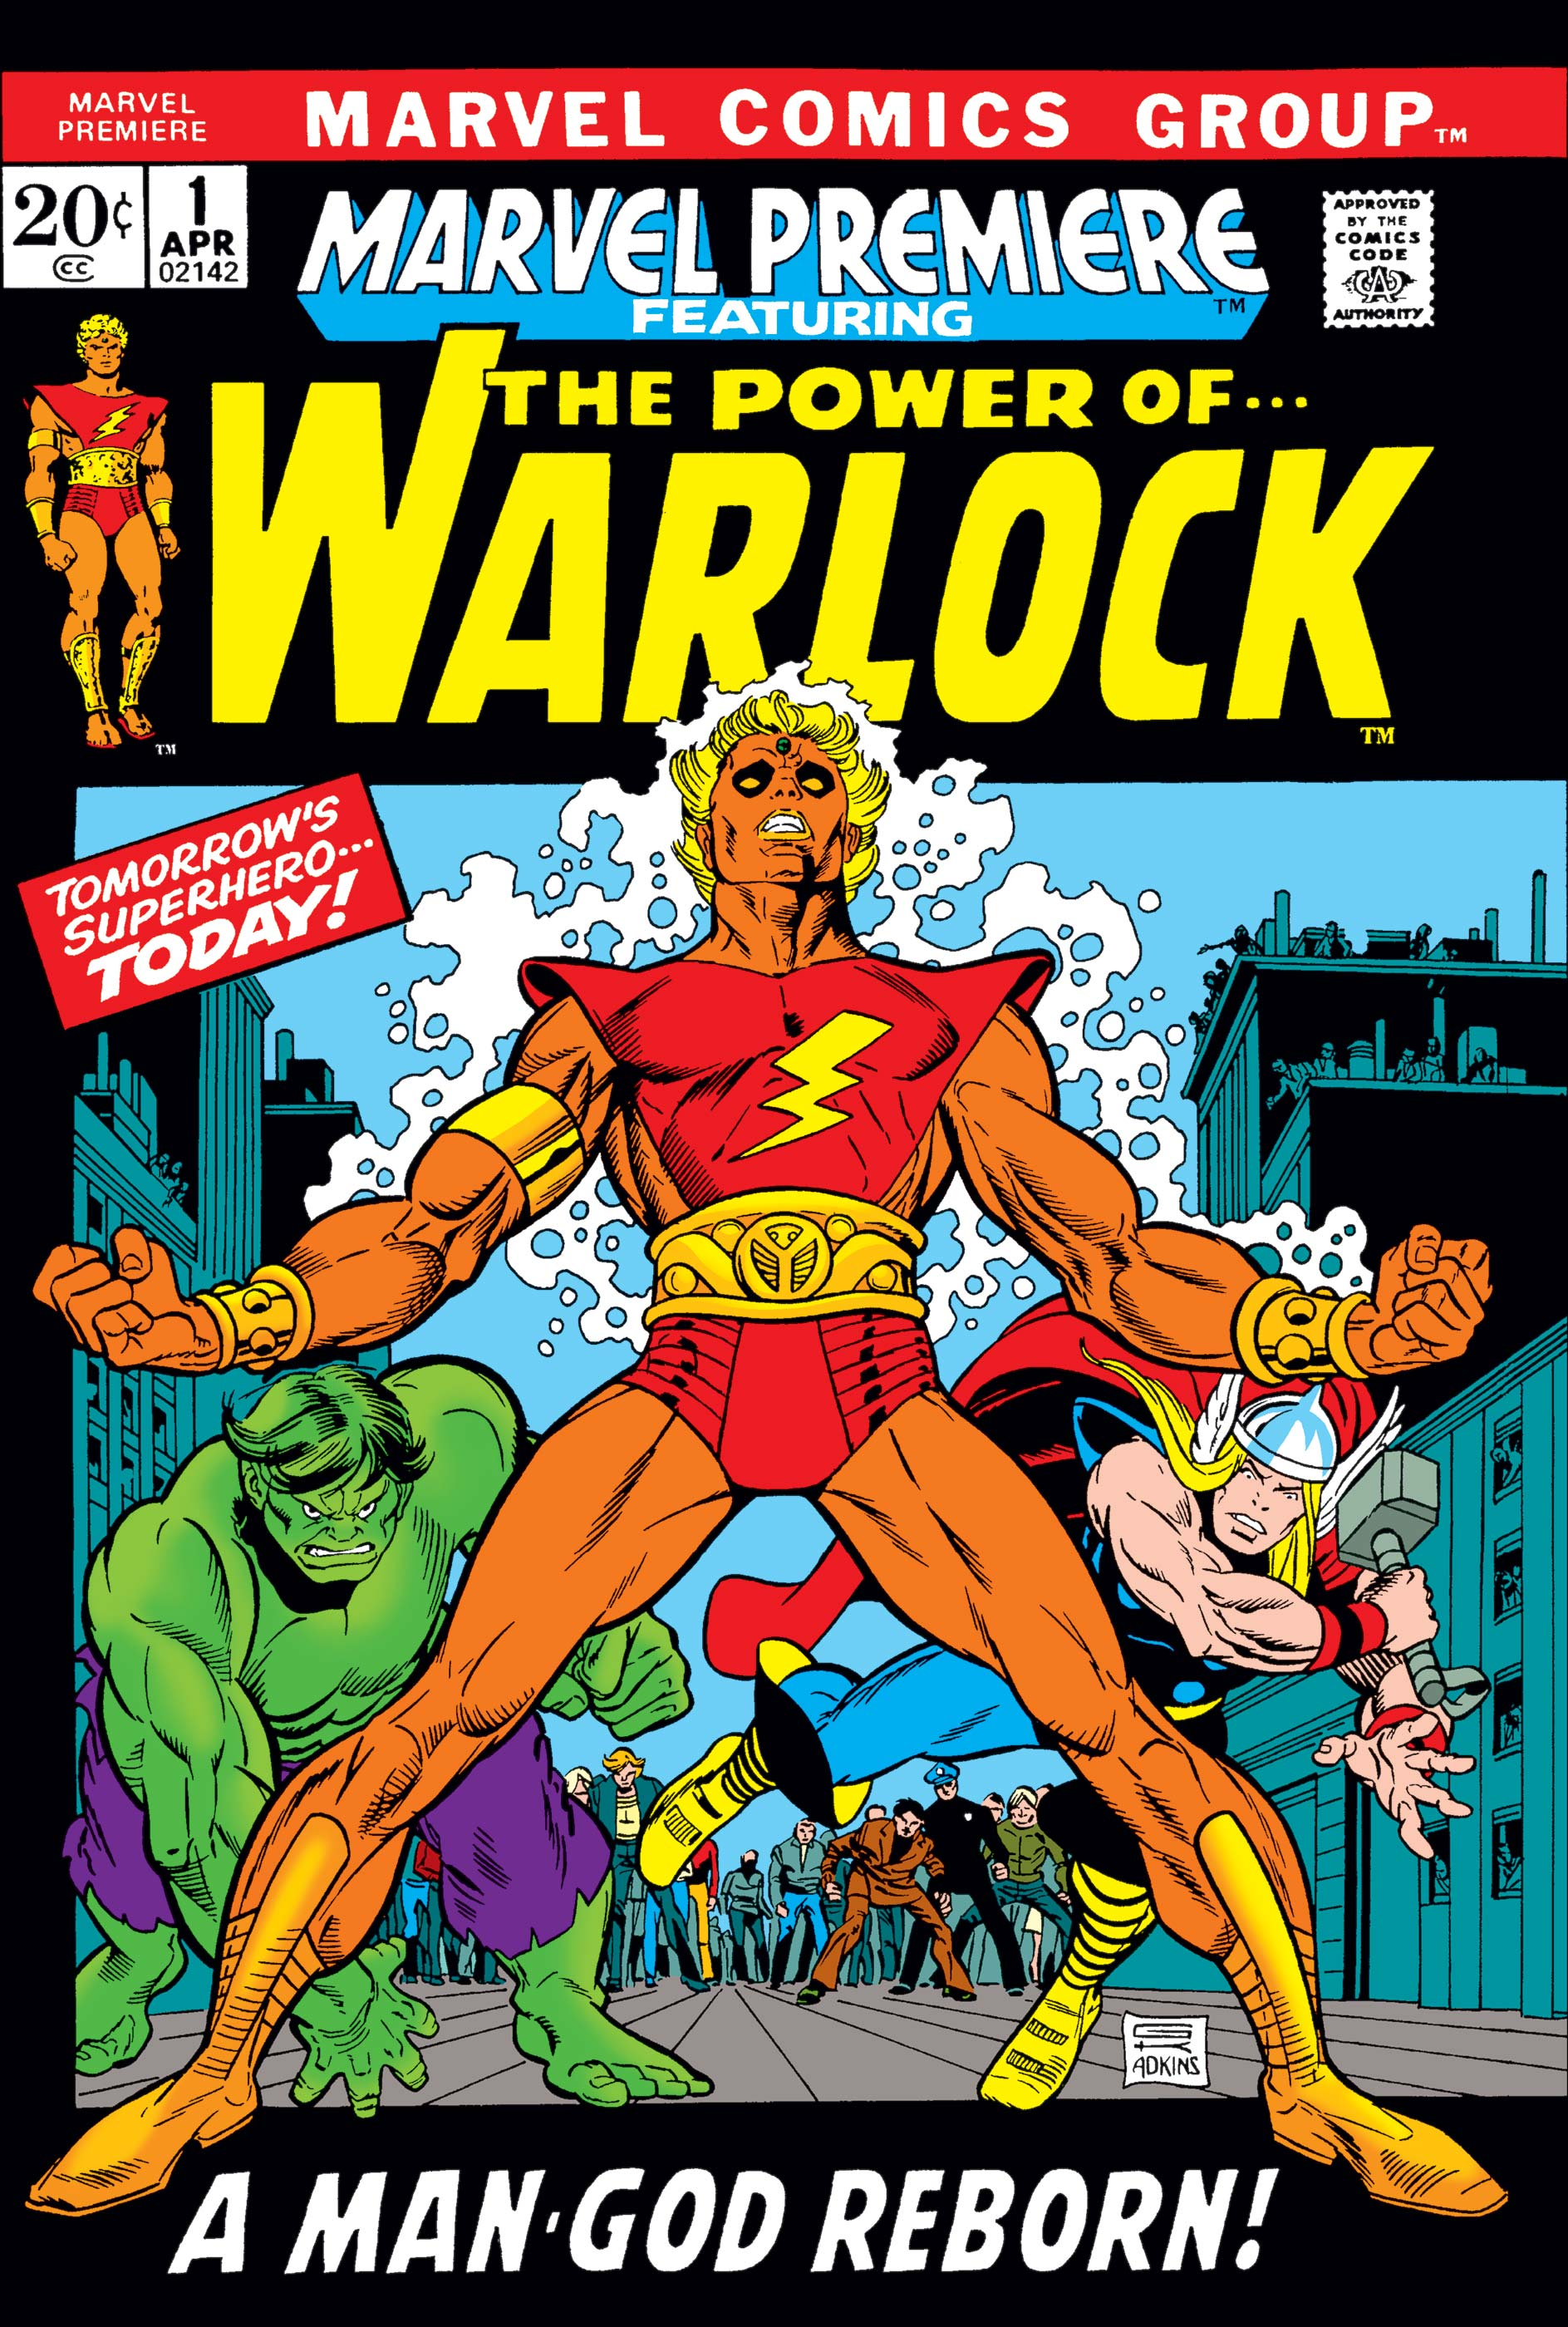 Marvel Premiere (1972) #1